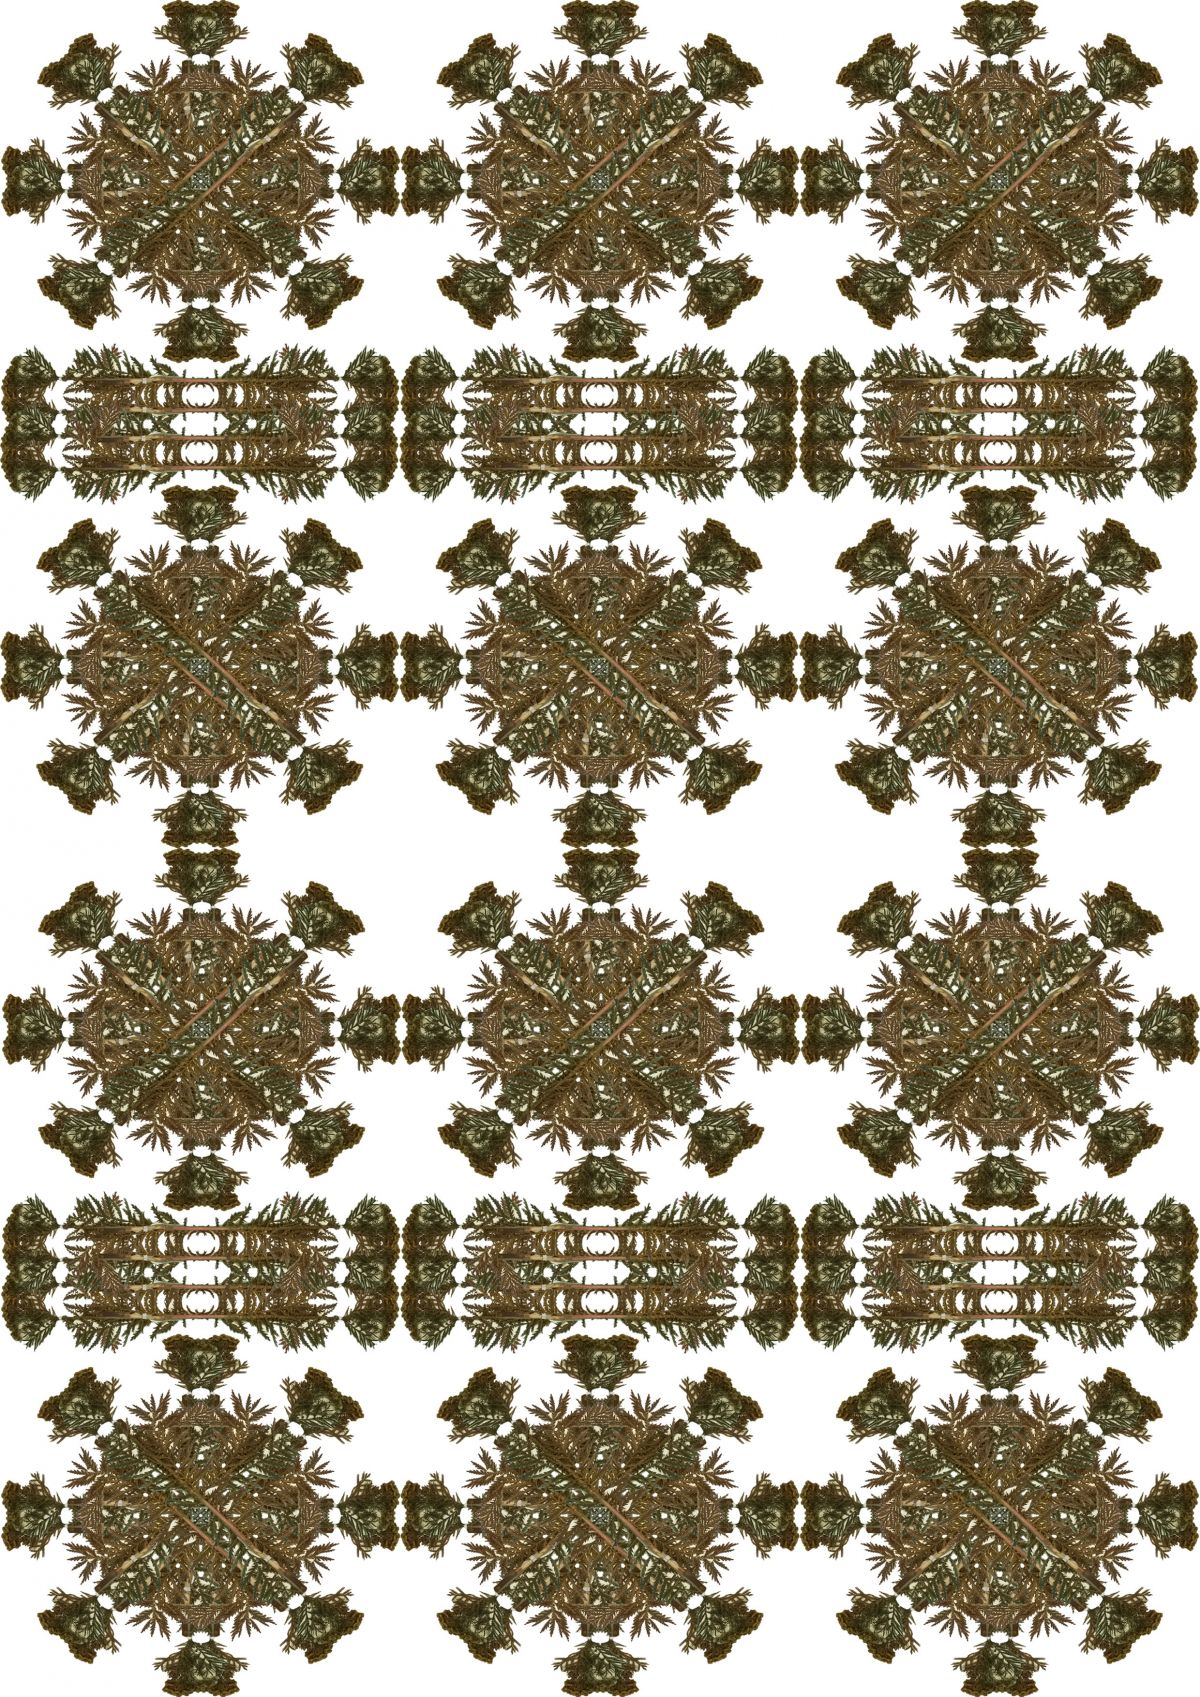 Kaleidescopic artwork manipulating images of a Tansy botanical specimen